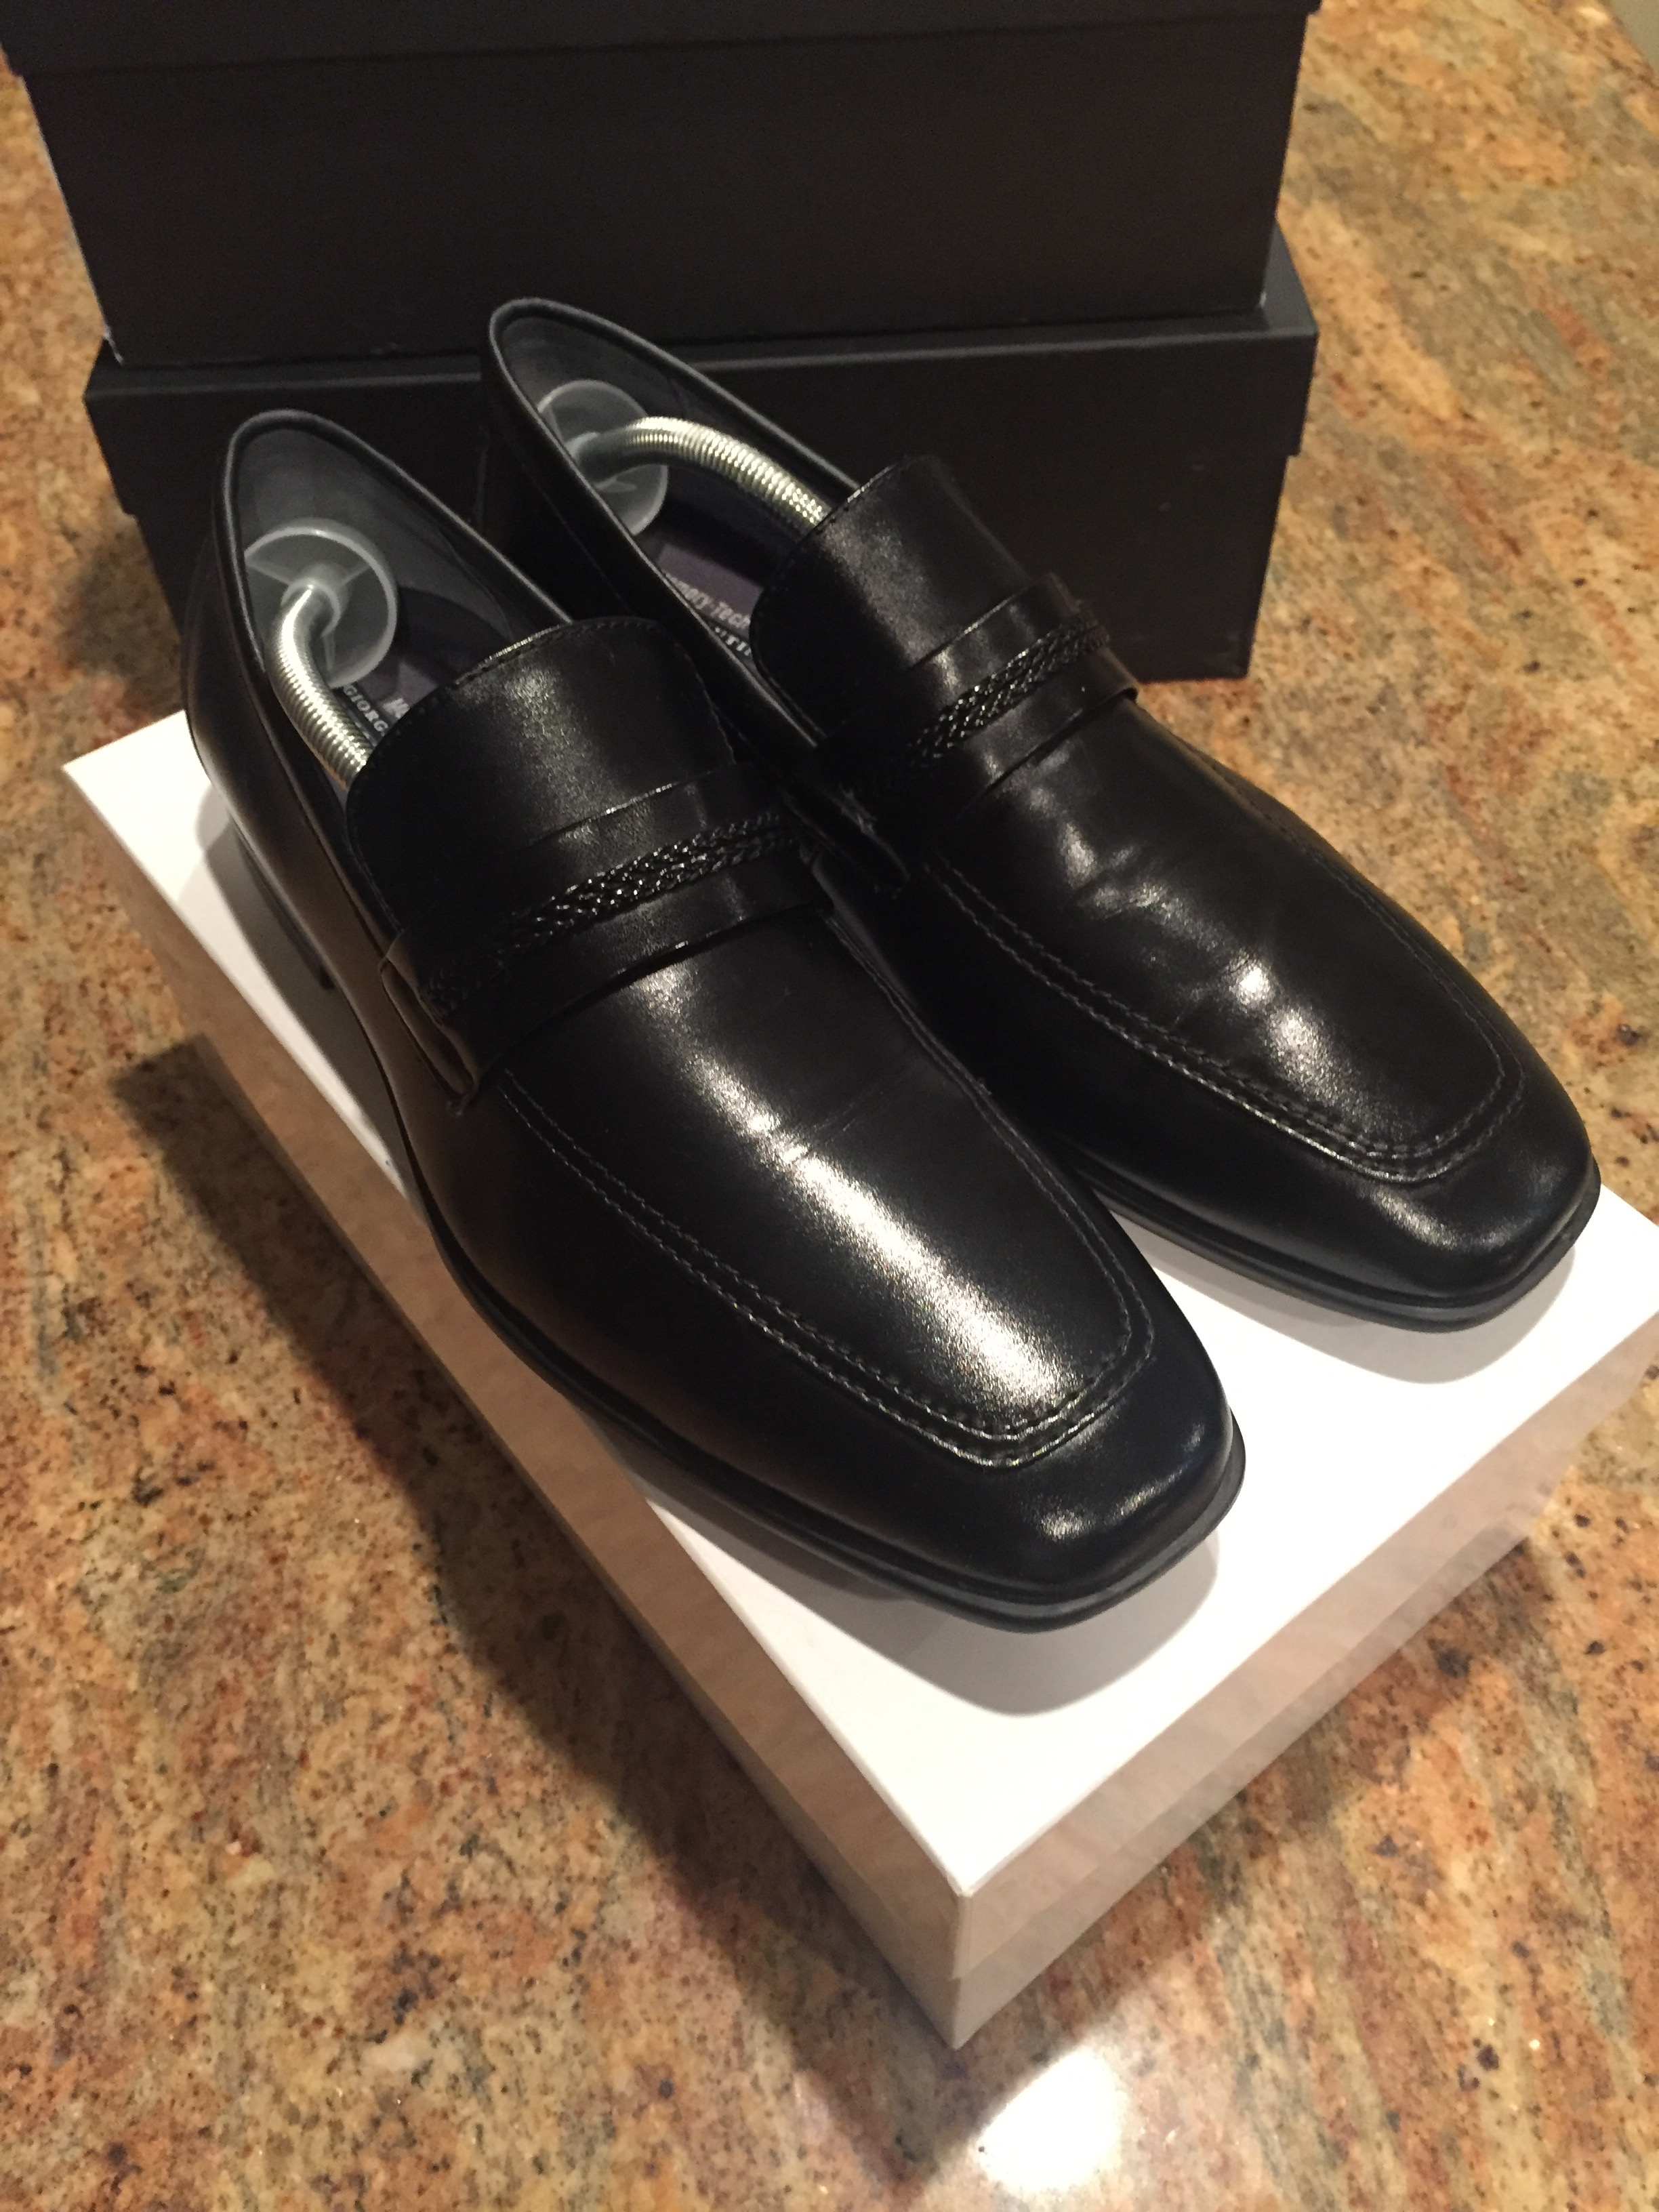 f524557e1d1 Giorgio Brutini NEW Giorgio Brutini Men s Liston 176121 Dressy Black Loafers  Shoes Size 11 - Formal Shoes for Sale - Grailed